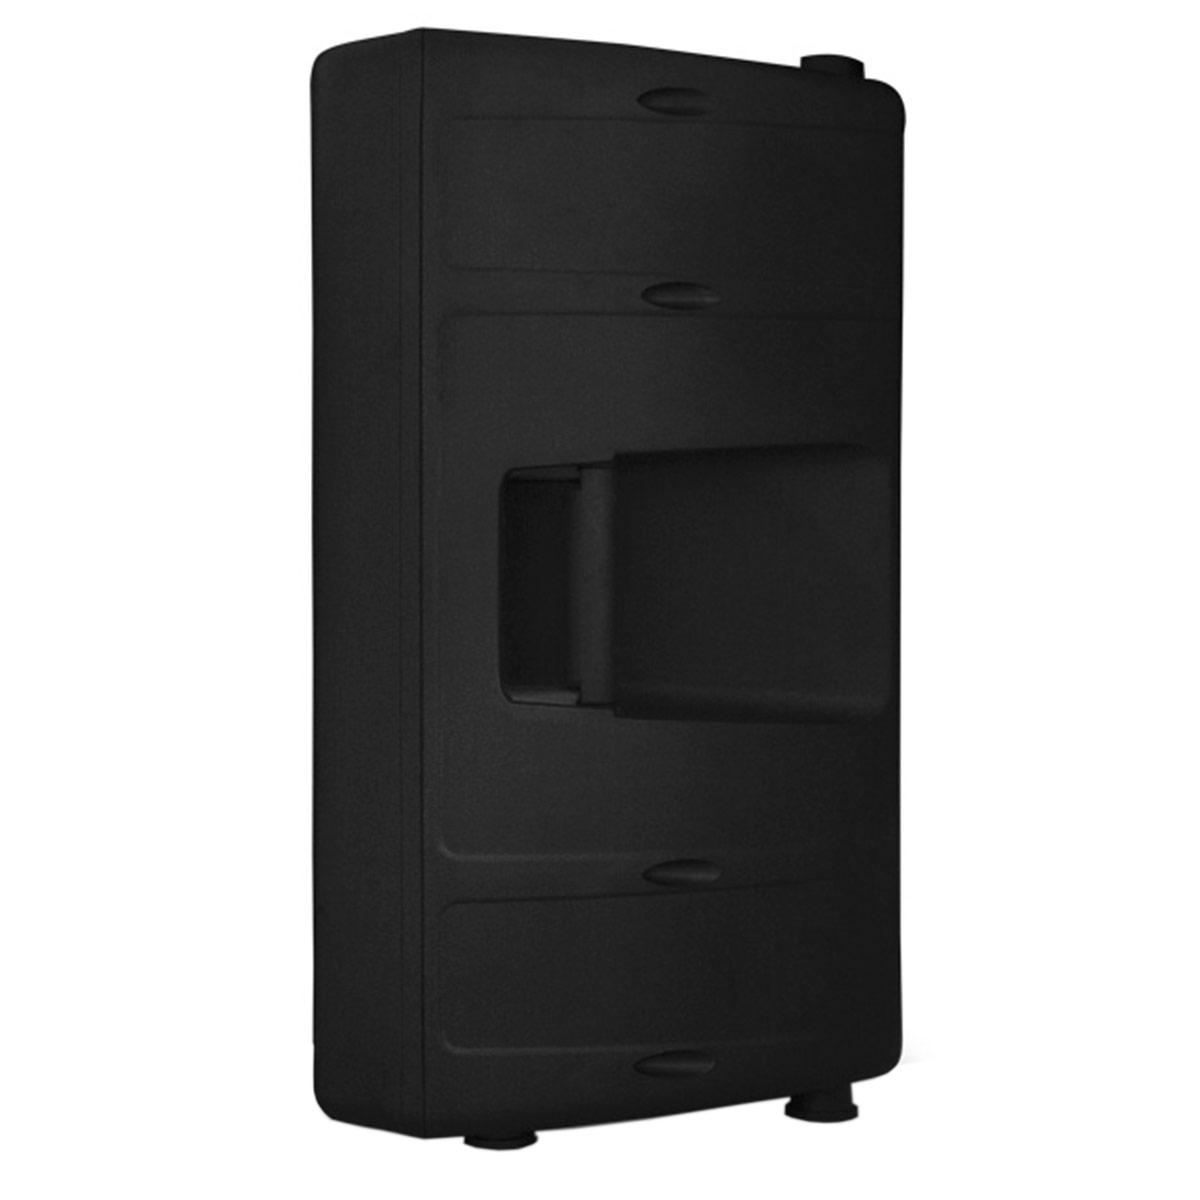 EVO300AUSB - Caixa Ativa 250W c/ USB EVO 300 A USB - Novik Neo